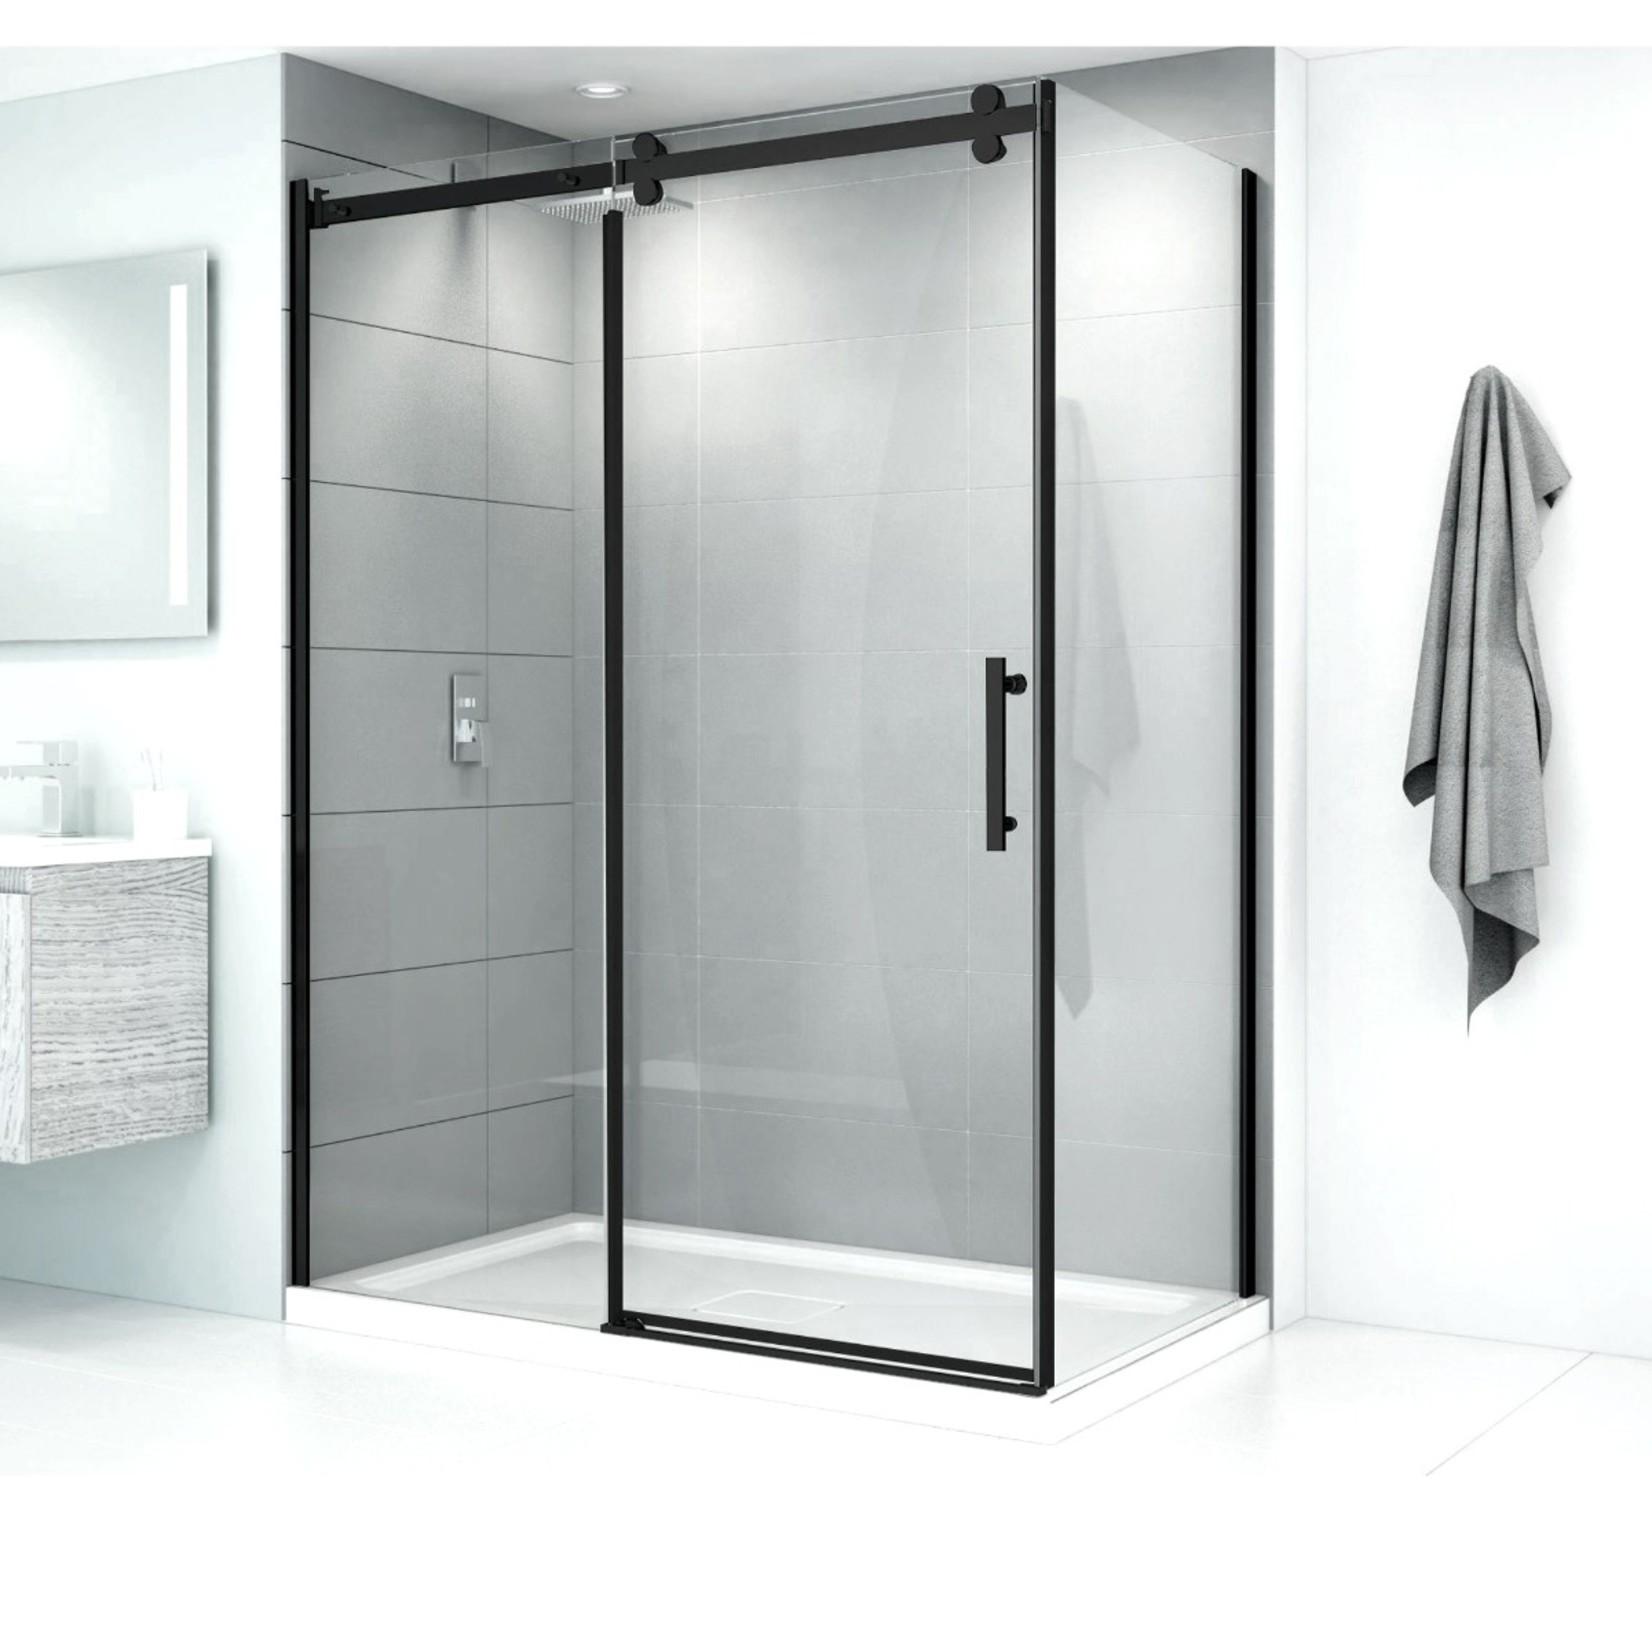 Reversible shower set 36x48 black Quartz series CDC